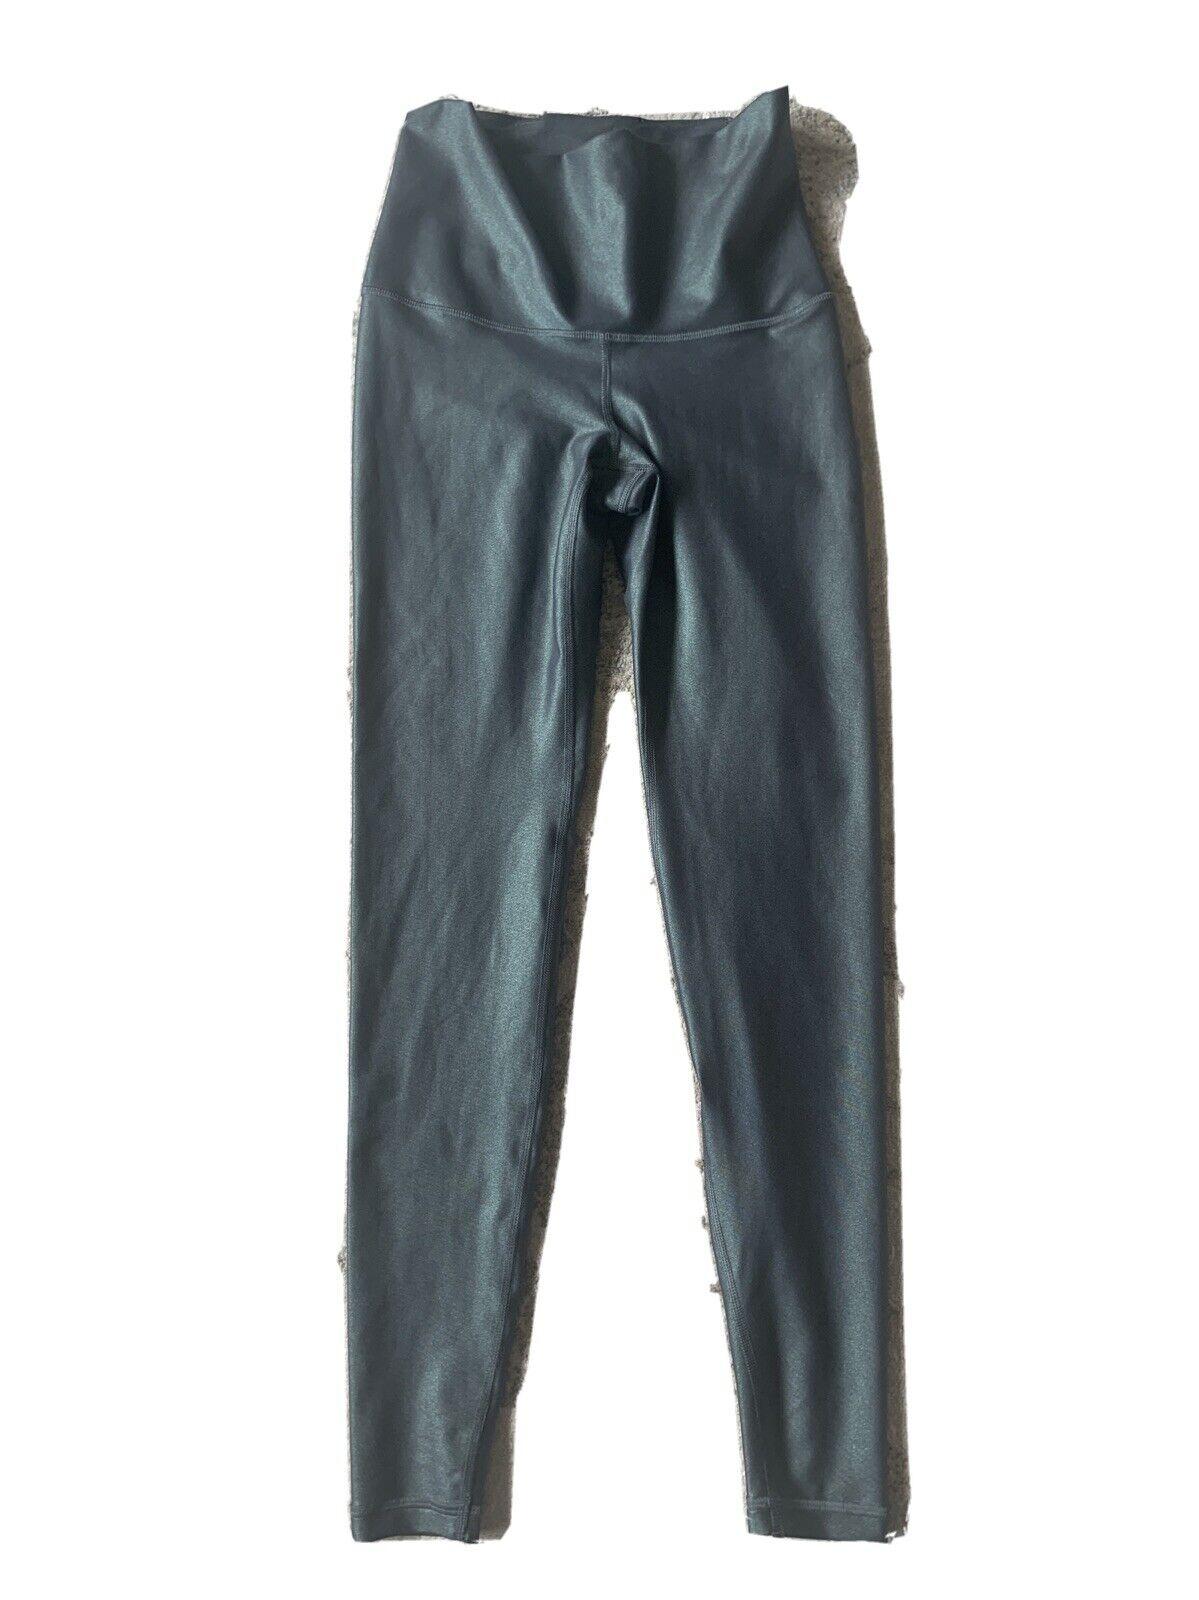 old navy go dry leggings green Metallic size small